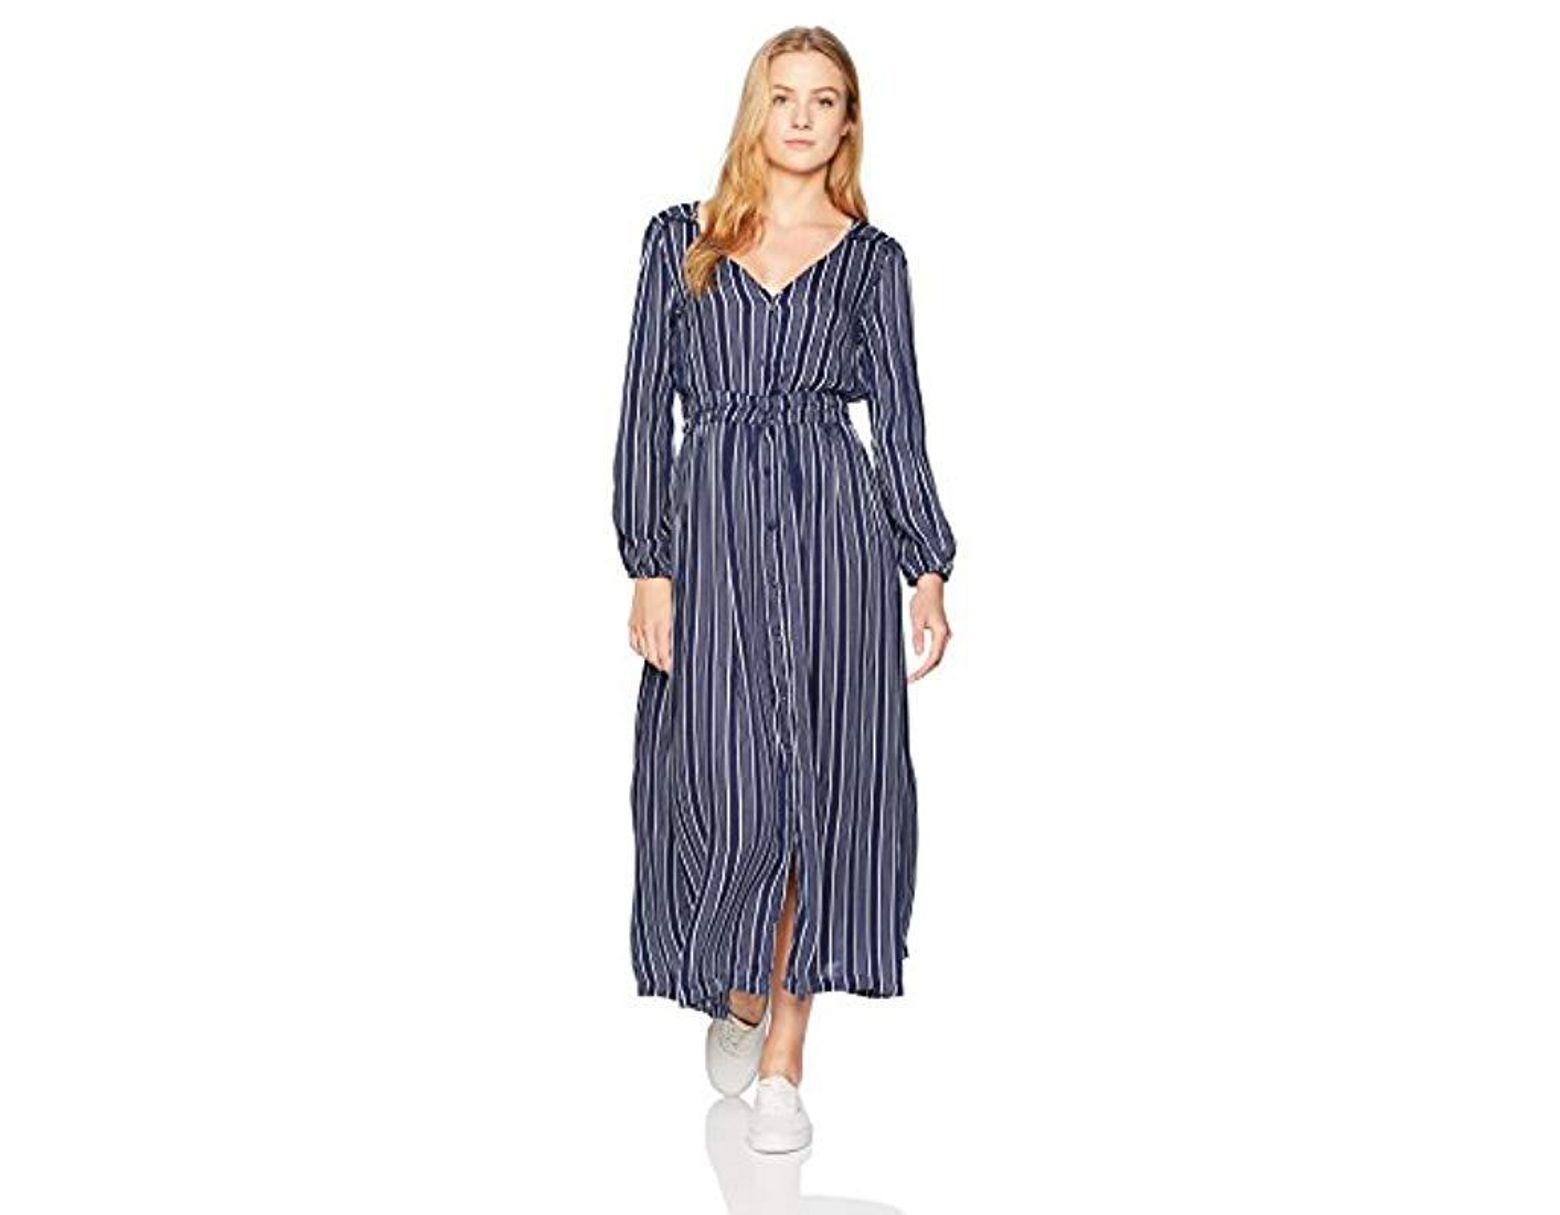 8a239fca502766 Roxy Subway Atmosphere Dress in Blue - Lyst